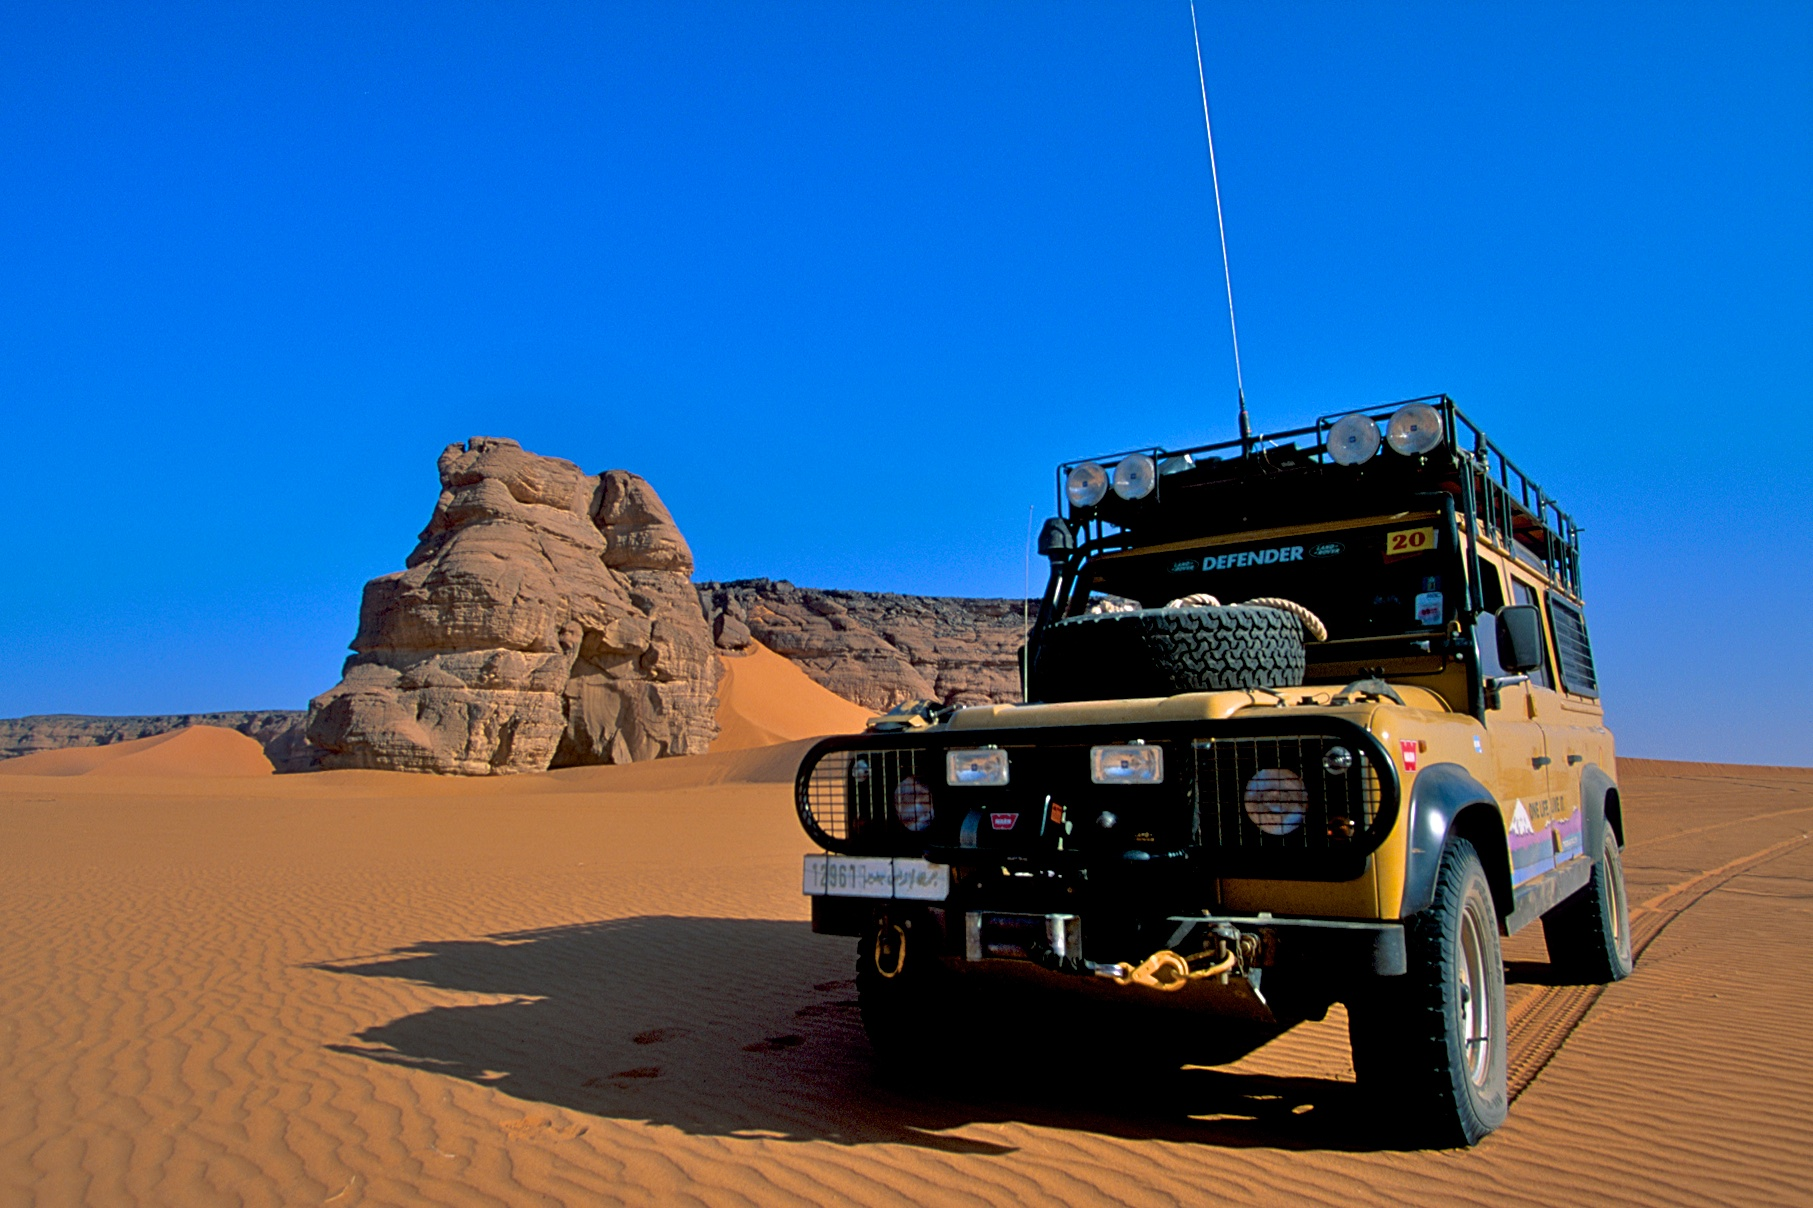 land rover adventure travel - HD1813×1208